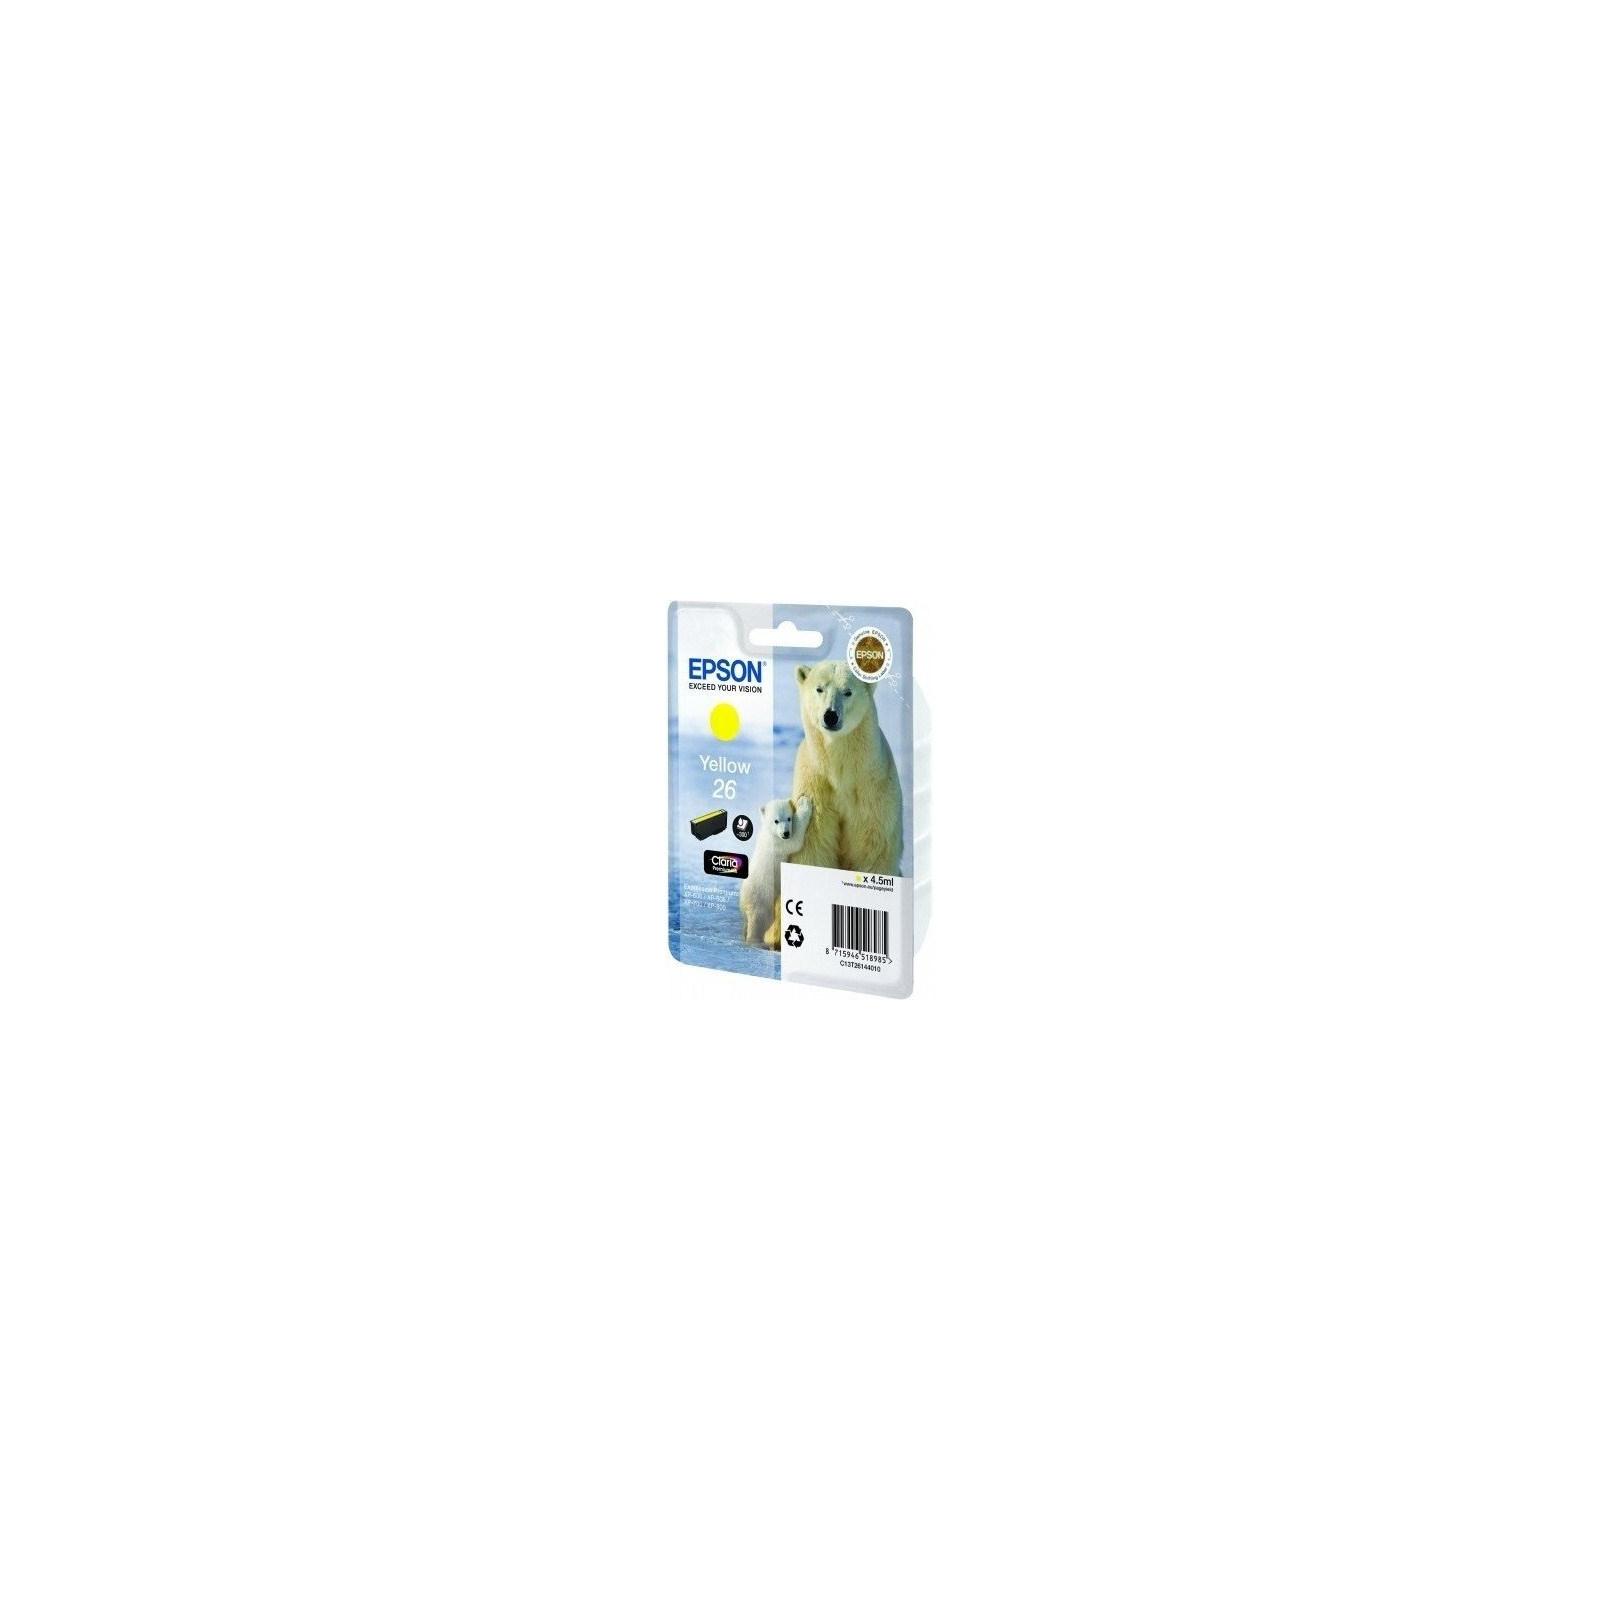 Картридж EPSON 26 XP600/605/700 yellow (C13T26144010)